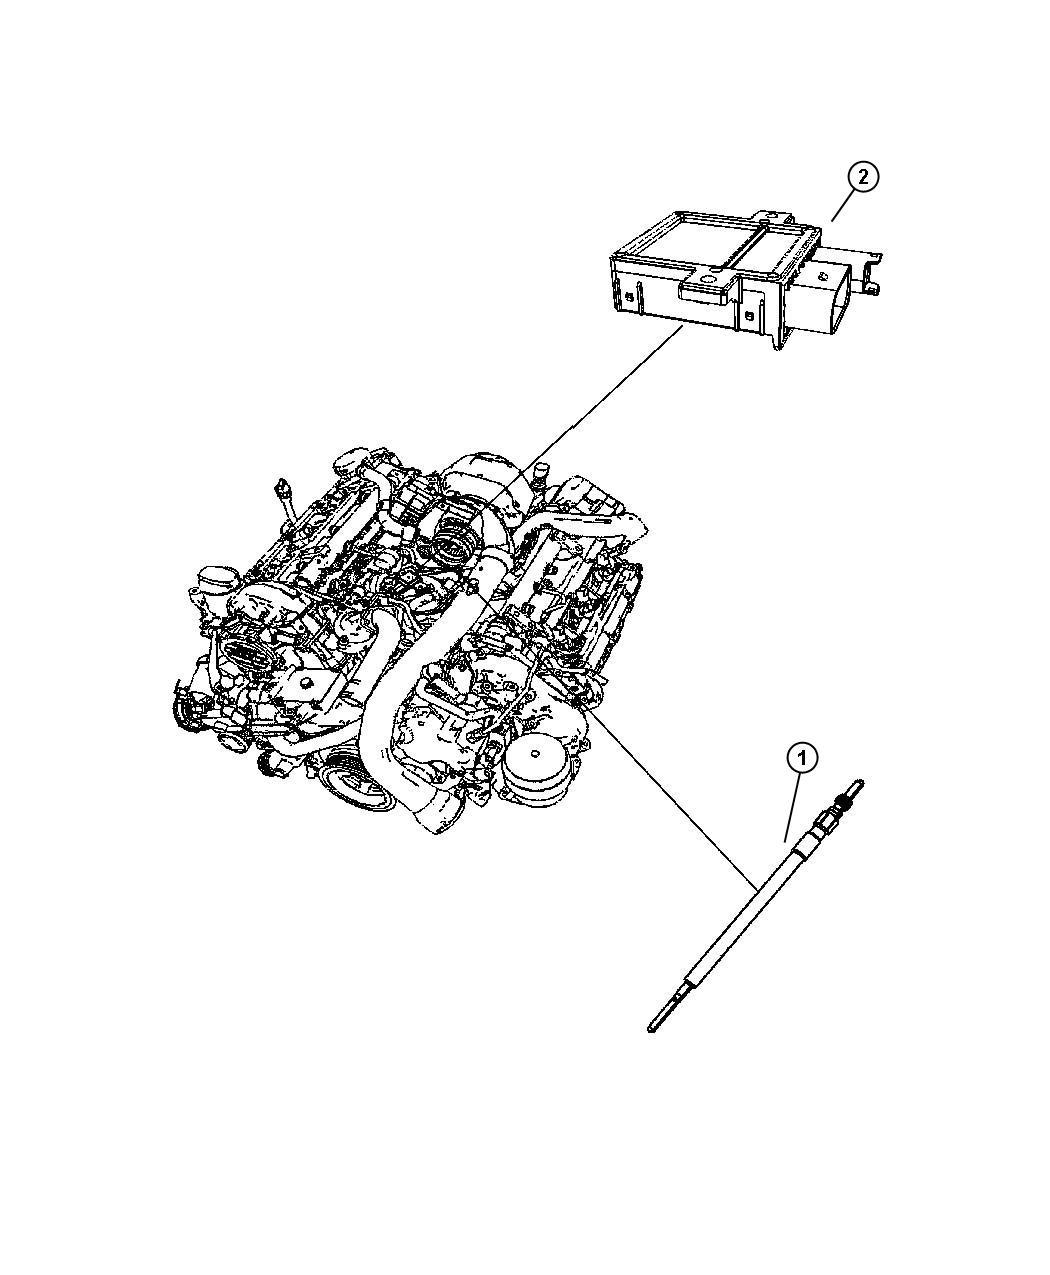 Jeep Grand Cherokee 4x2 3 0l V6 Turbosel 5 Spd Auto